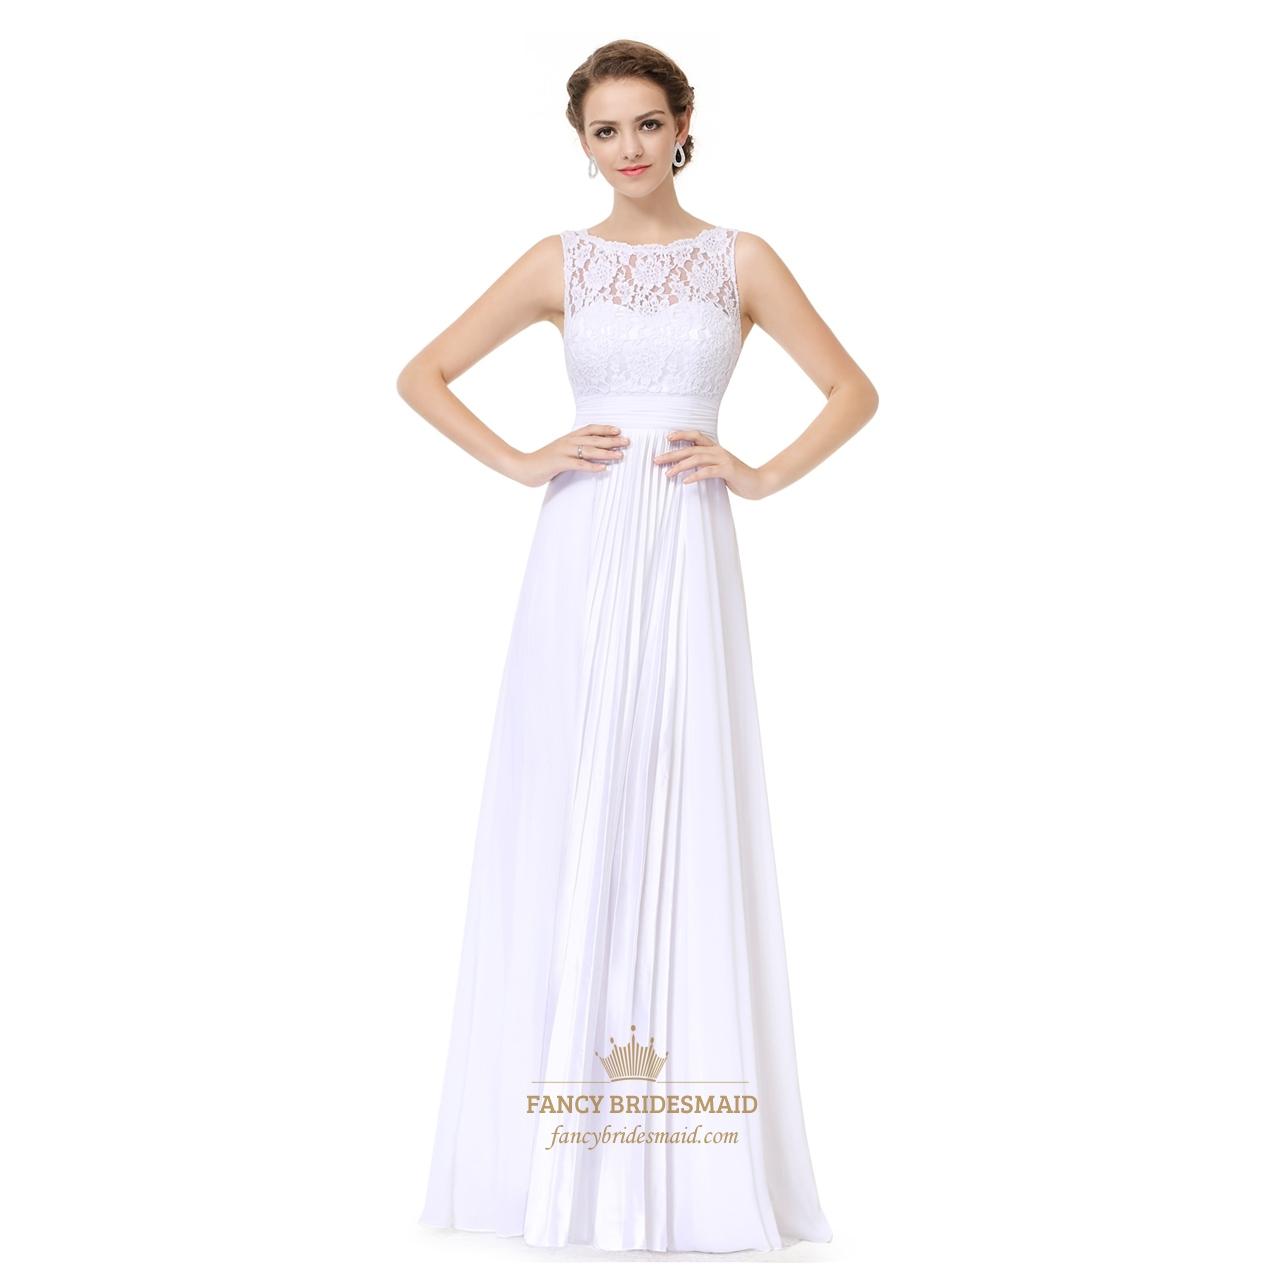 Burgundy chiffon sheer illusion neckline lace bodice dress for Wedding dresses with sheer illusion neckline